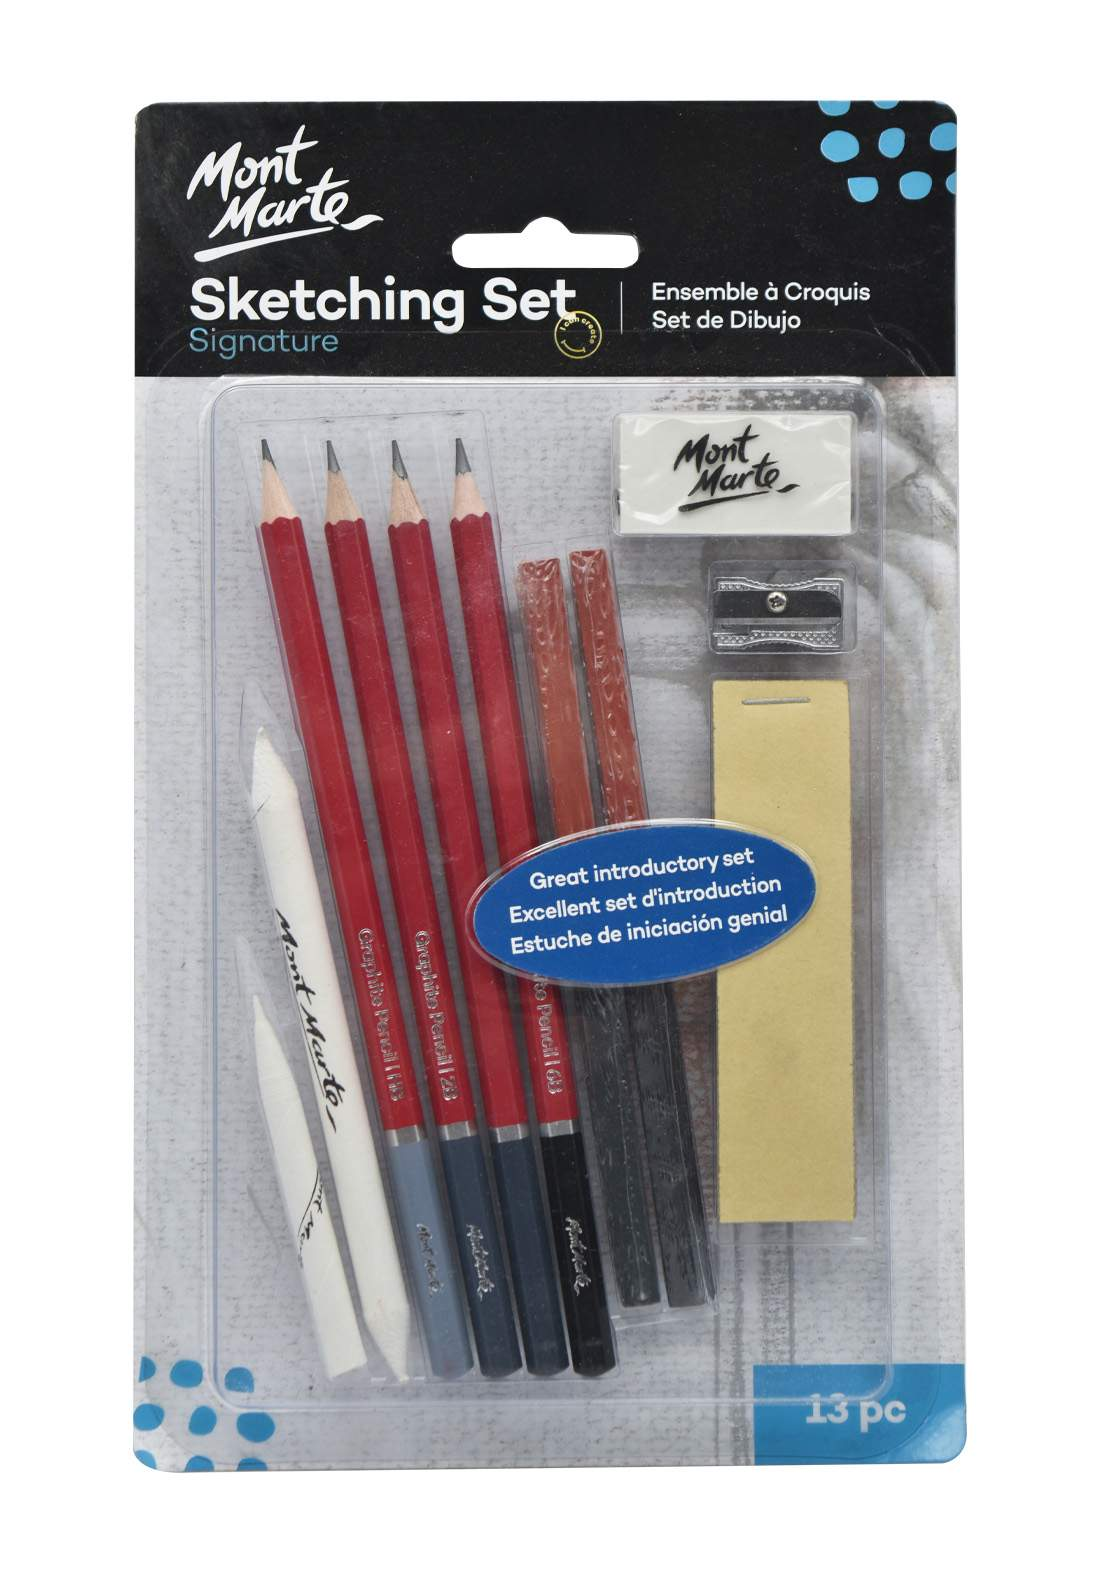 Mont Marte Signature Sketching Set 13 Pcs أقلام رصاص